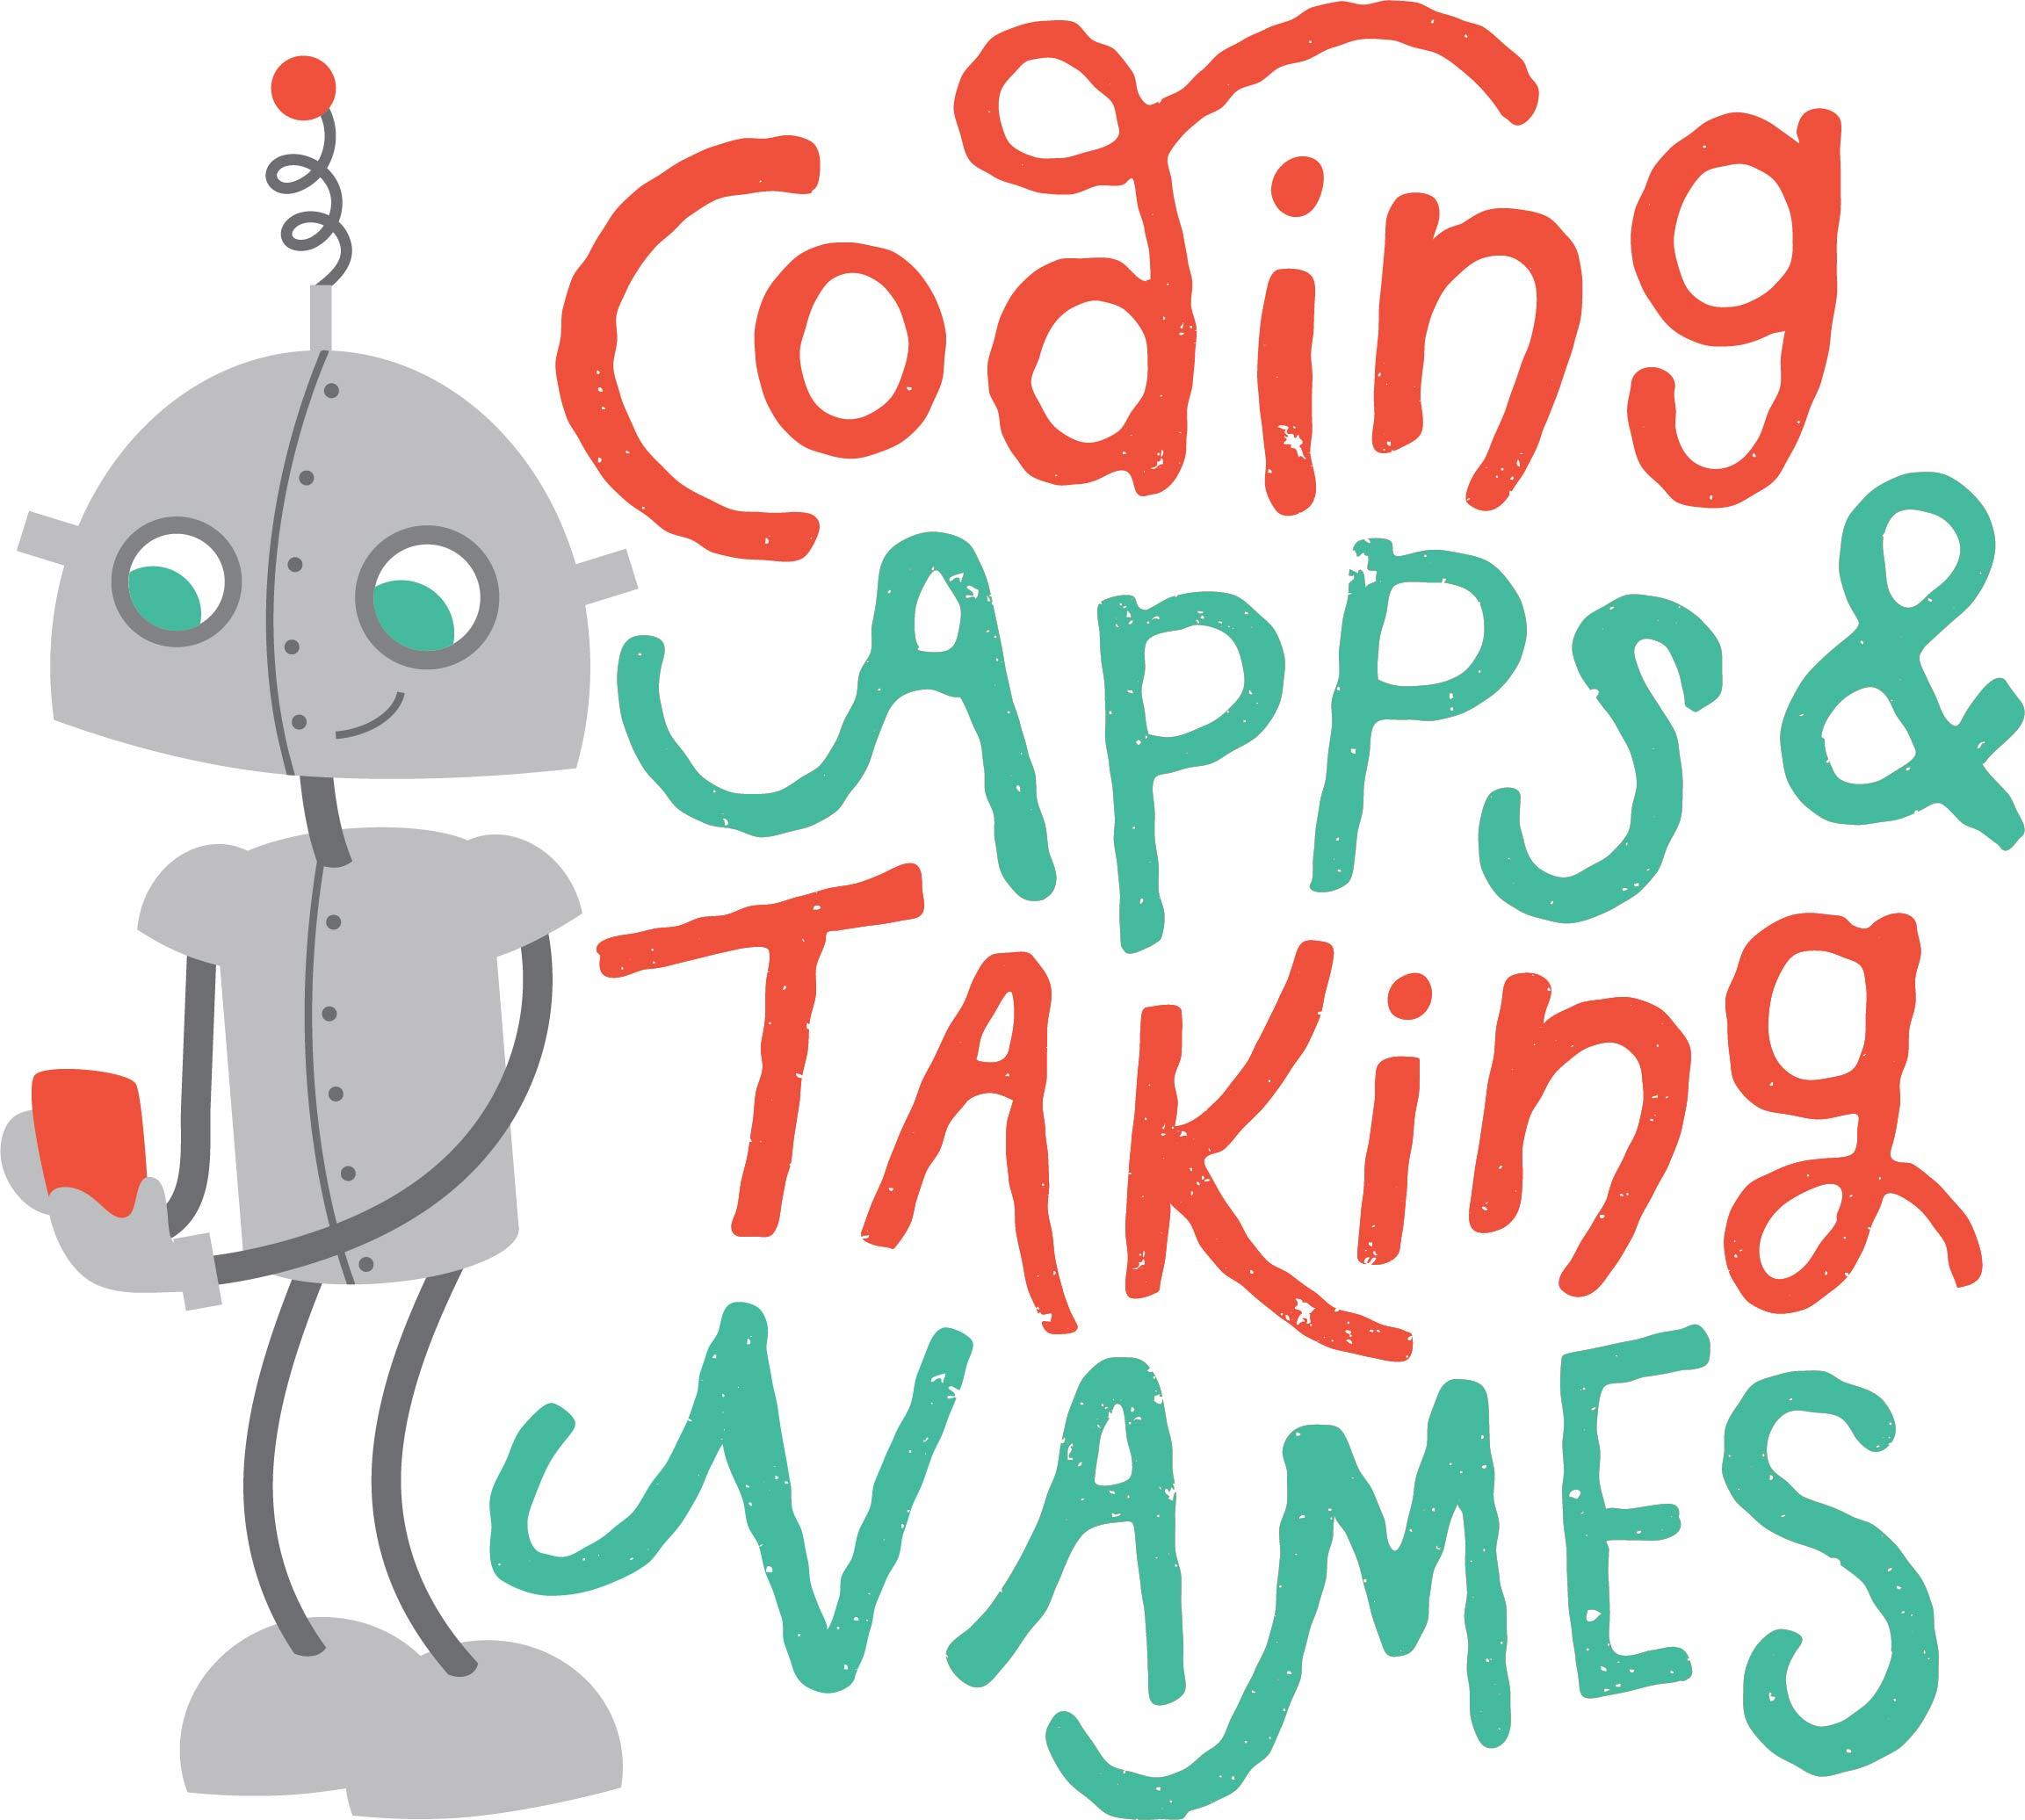 coding-robot.jpg